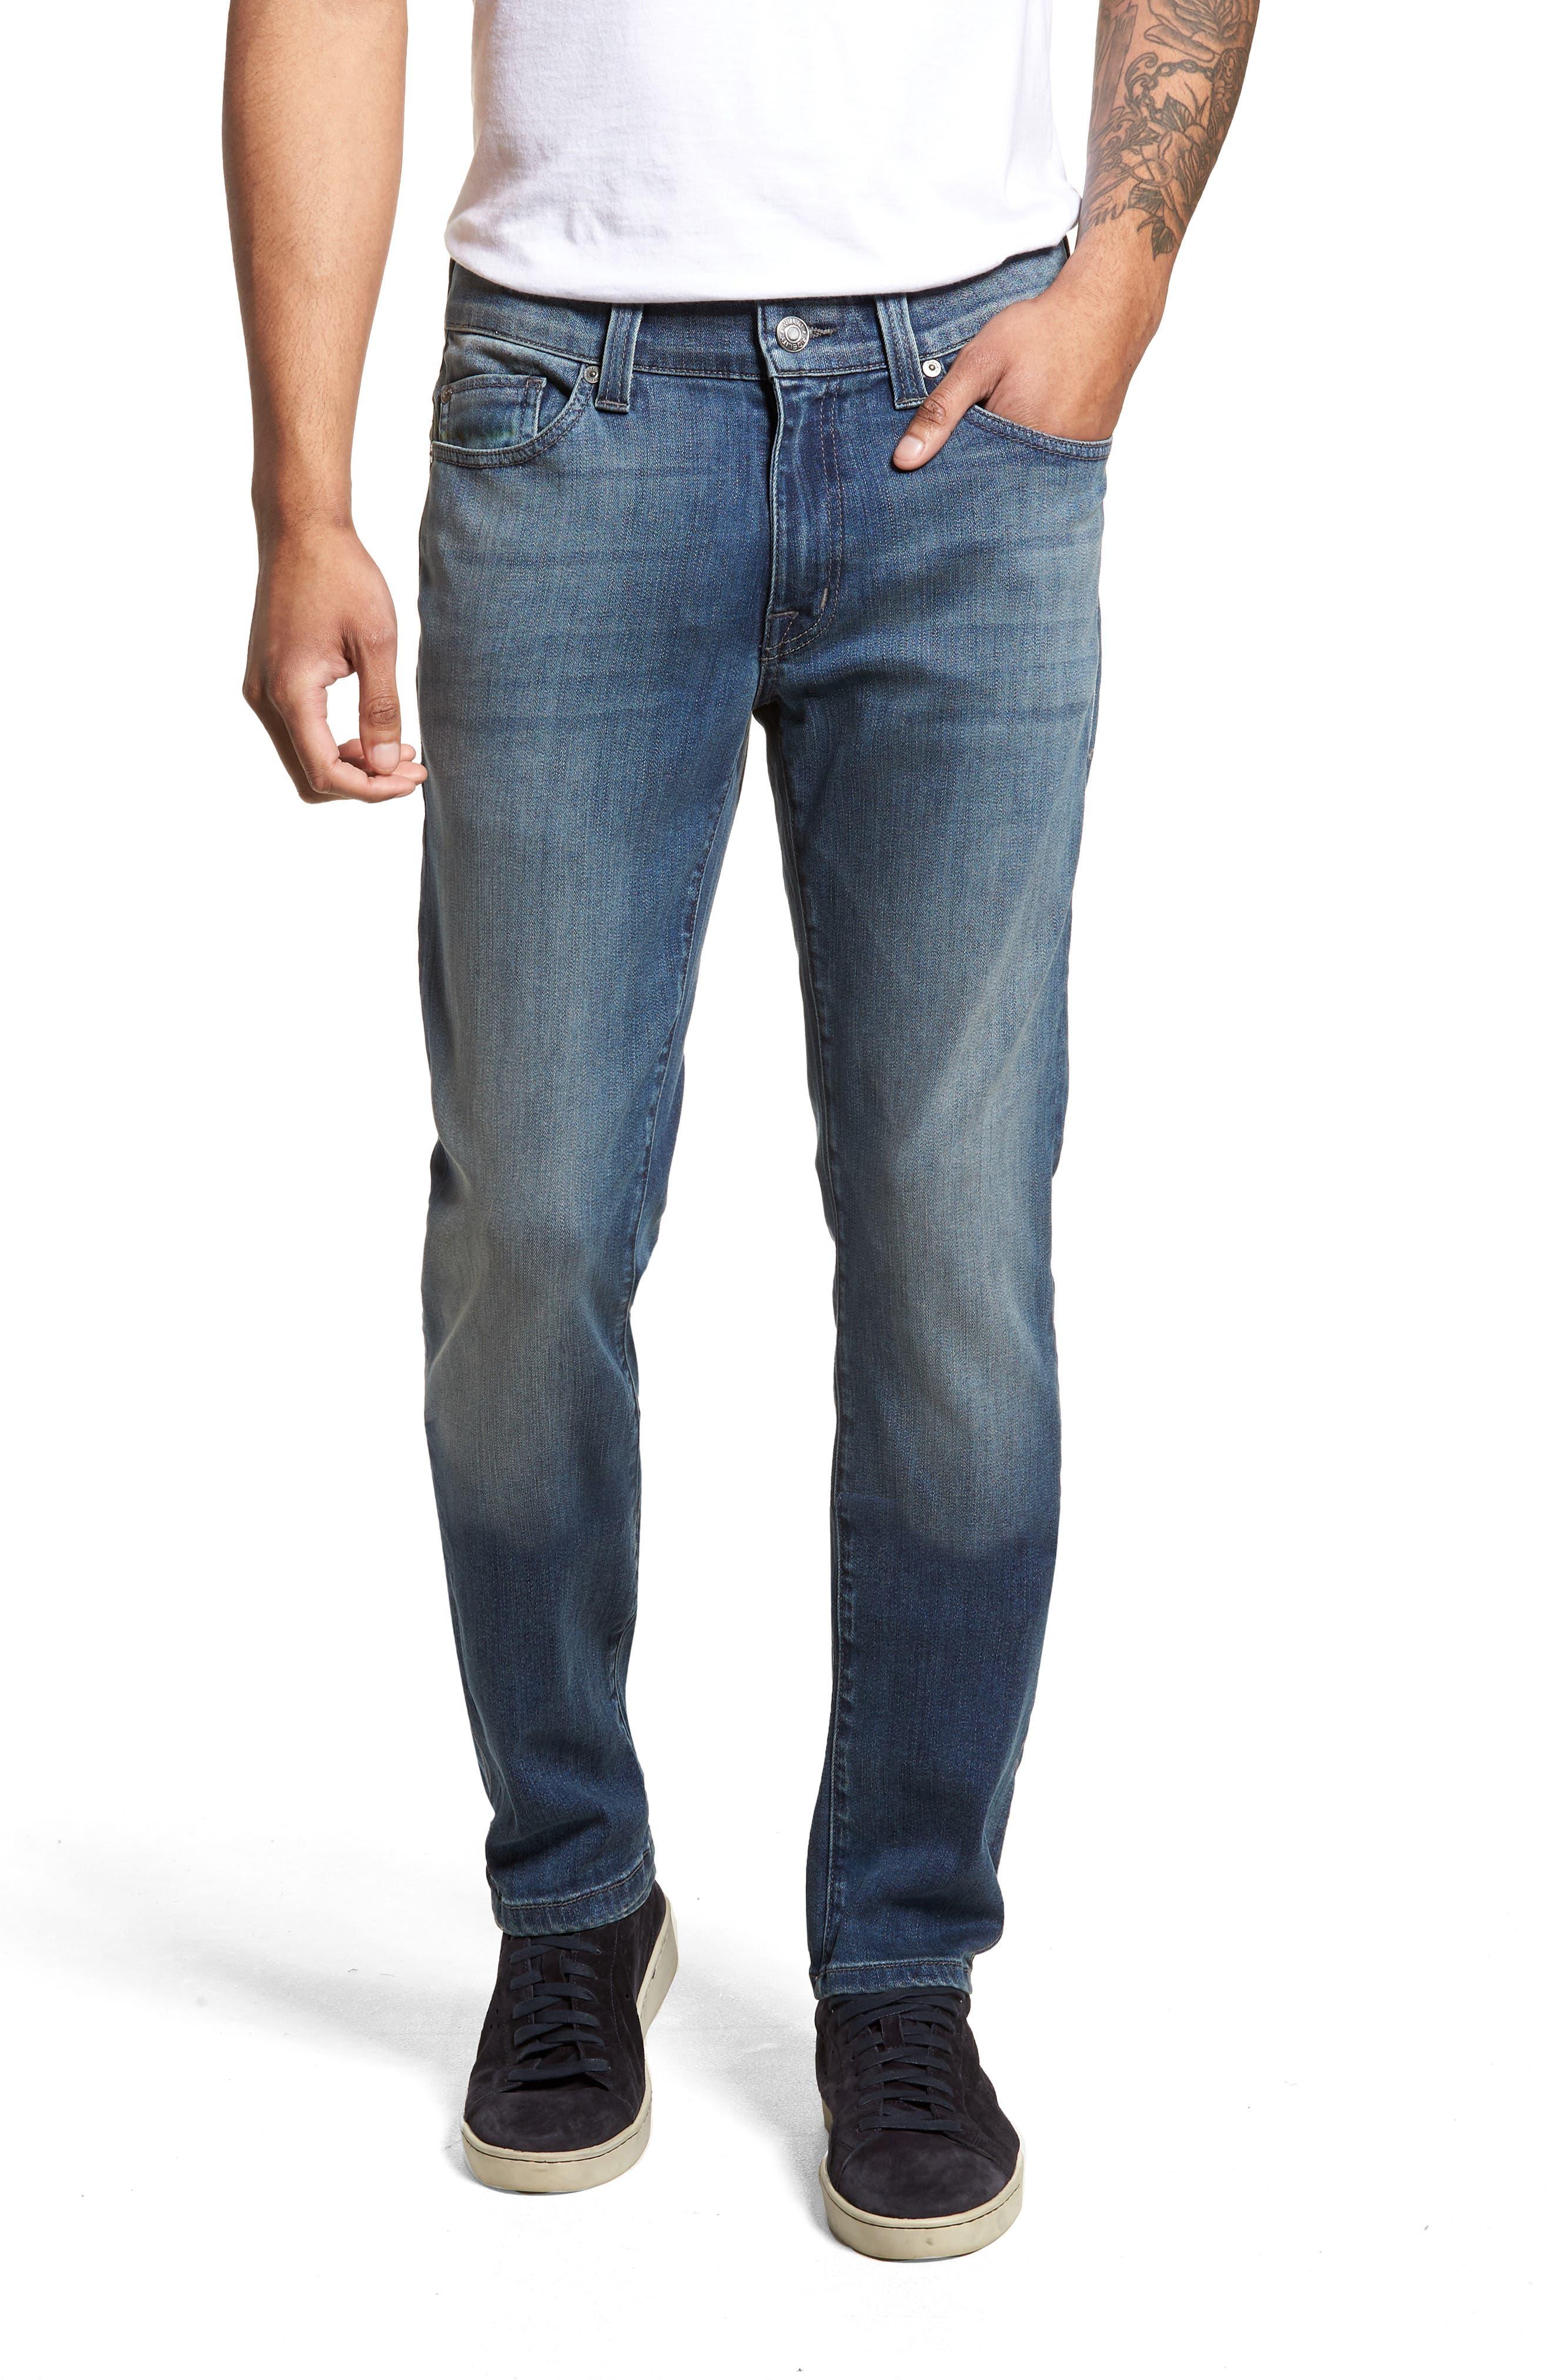 Torino Slim Fit Jeans,                             Main thumbnail 1, color,                             Atlas Blue